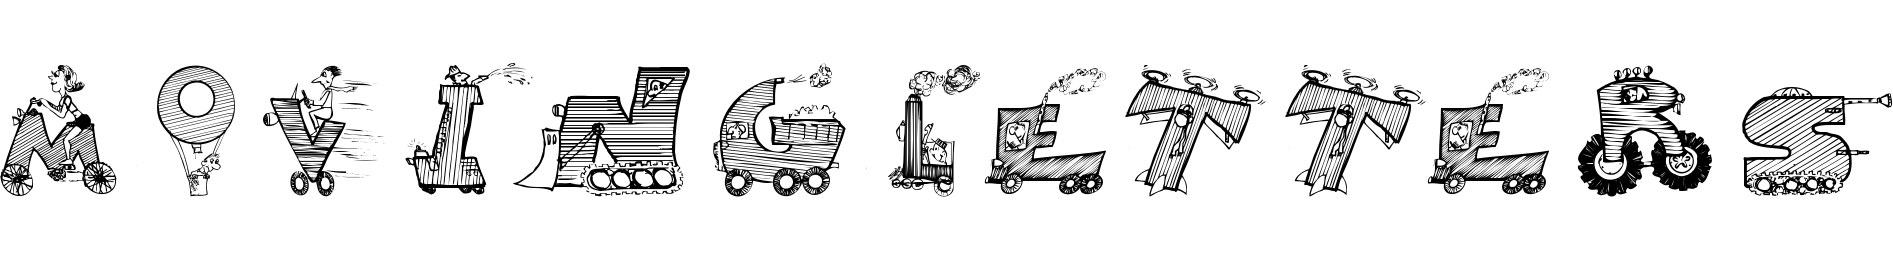 MovingLetters